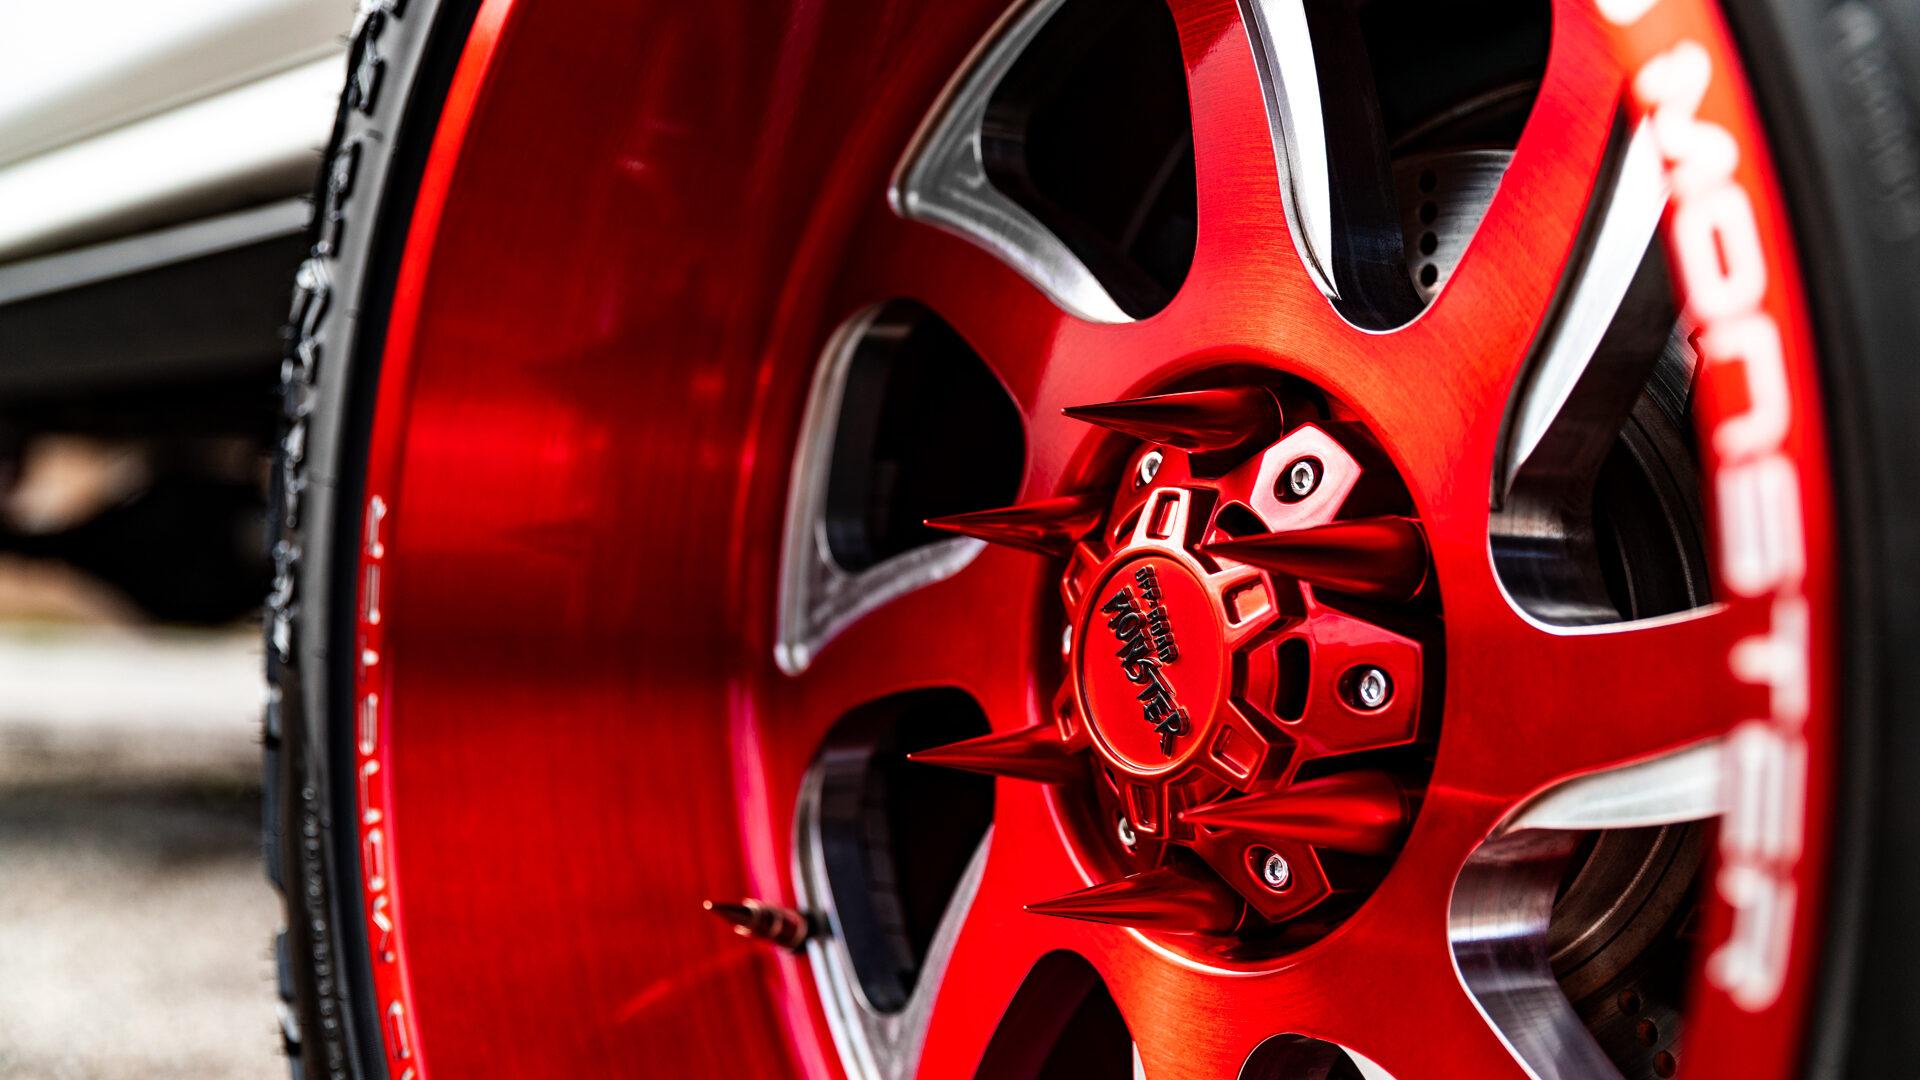 M22 Off-Road Monster Wheels 22x12 | Chevrolet Silverado